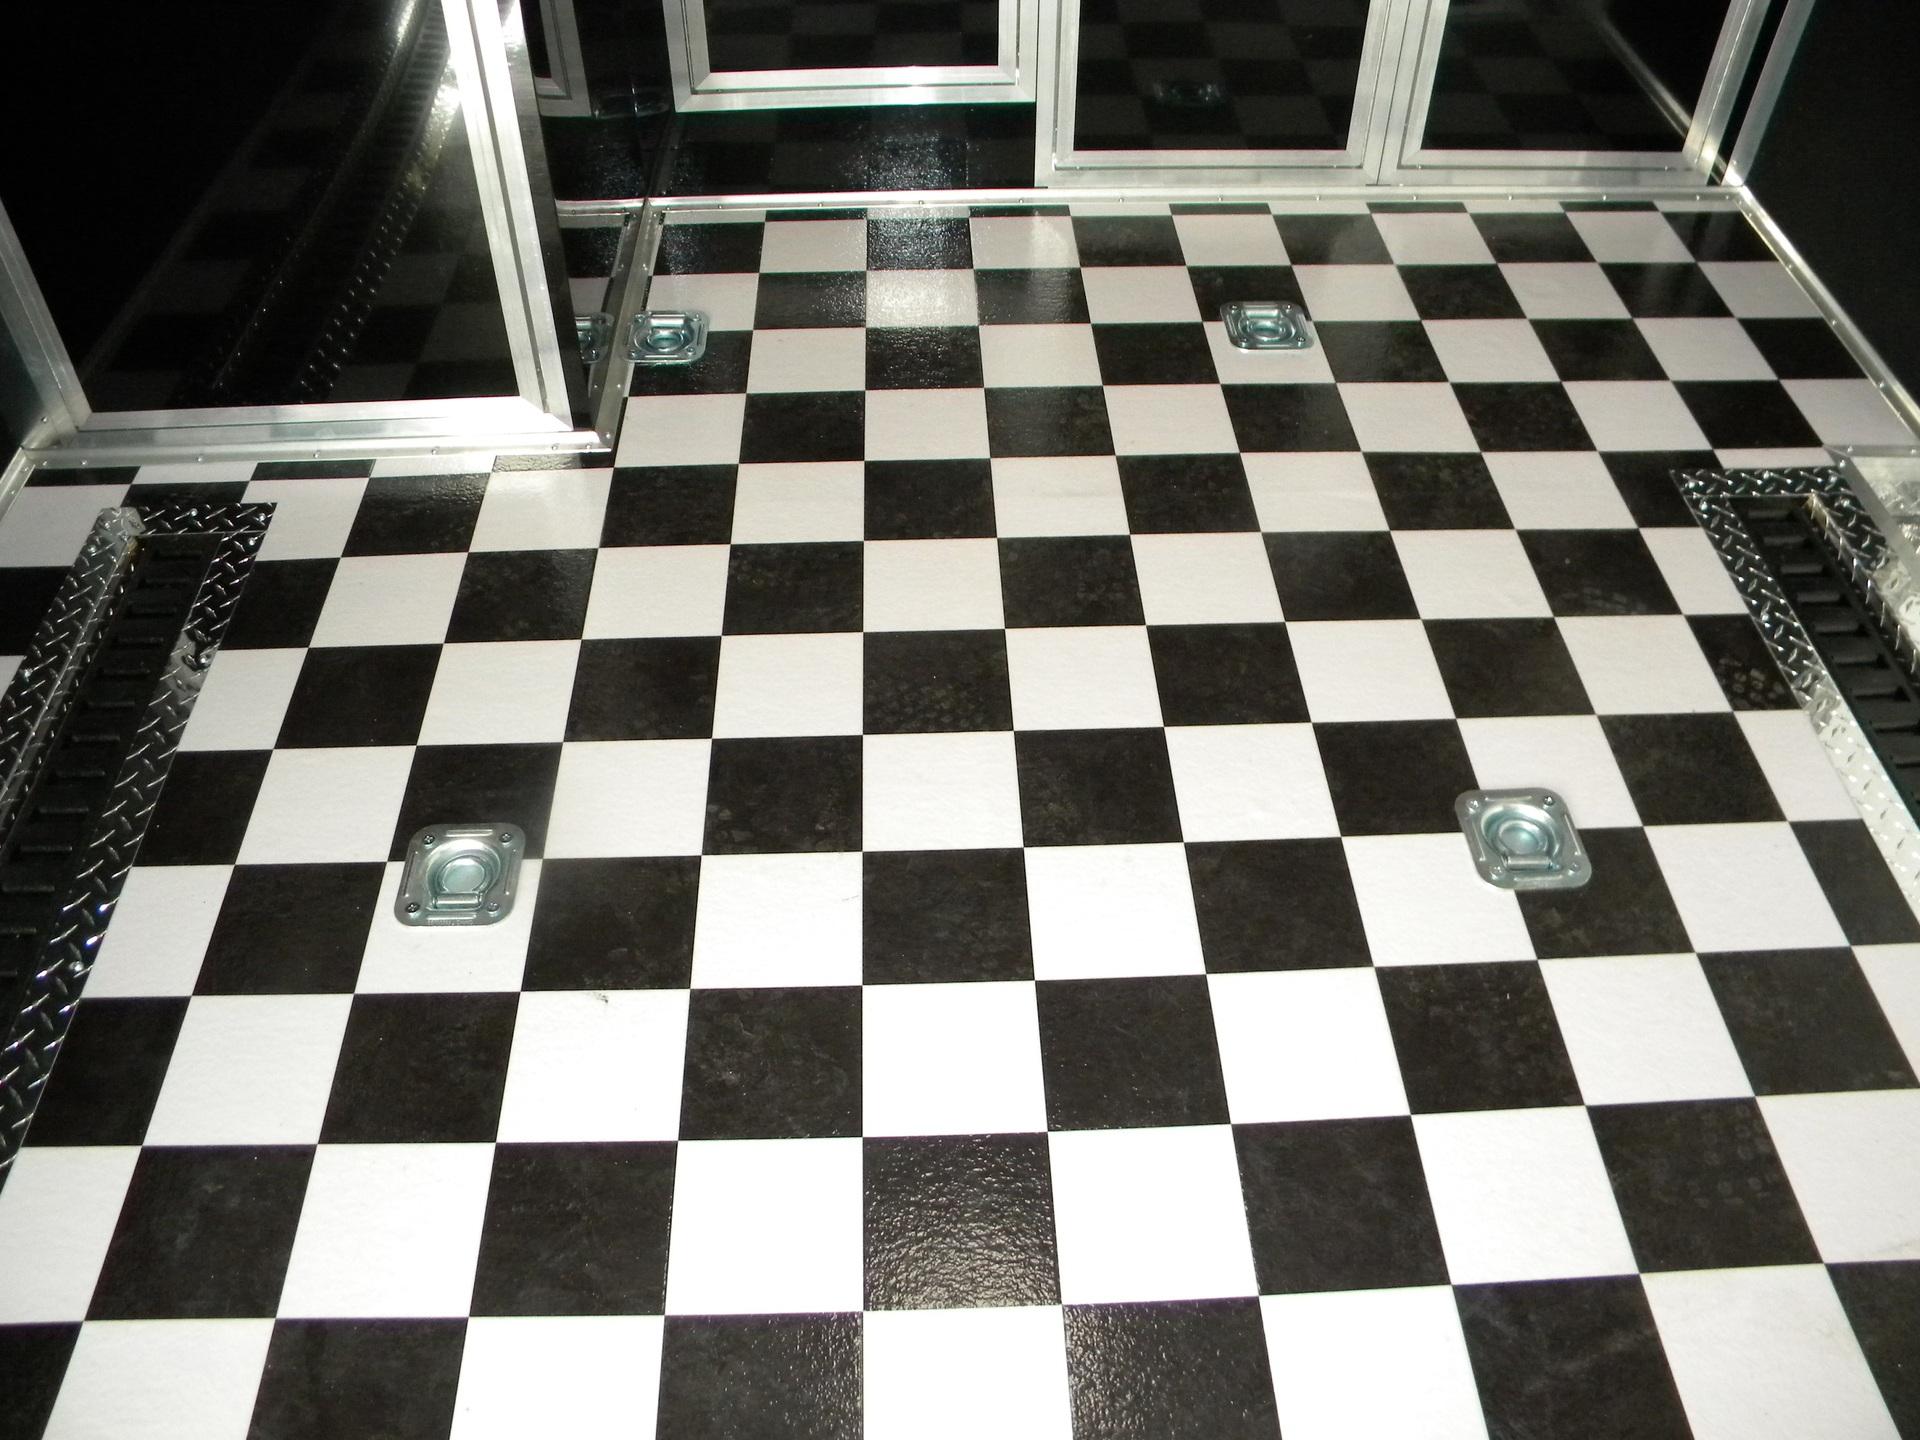 Traditional Tile Living Room Checkerboard Sheet Vinyl Wide Width Source Tile Grout Color Black Supply Black houzz 01 Black And White Tile Floor